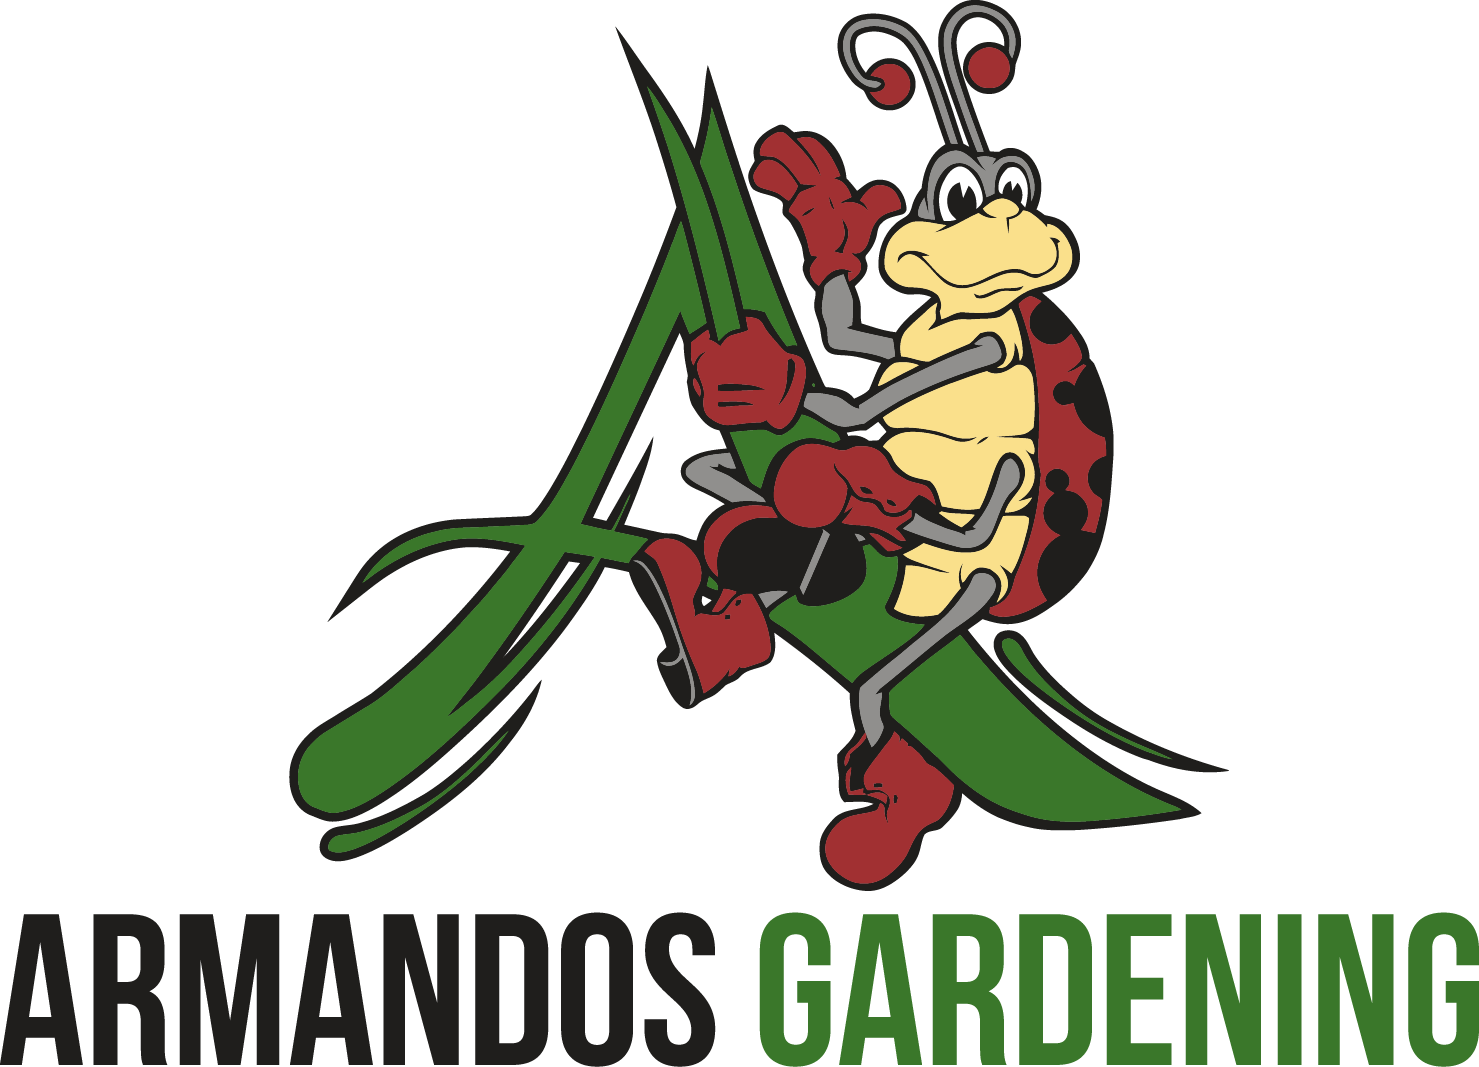 Armando s gardening armandosgardening. Gardener clipart proper care plant